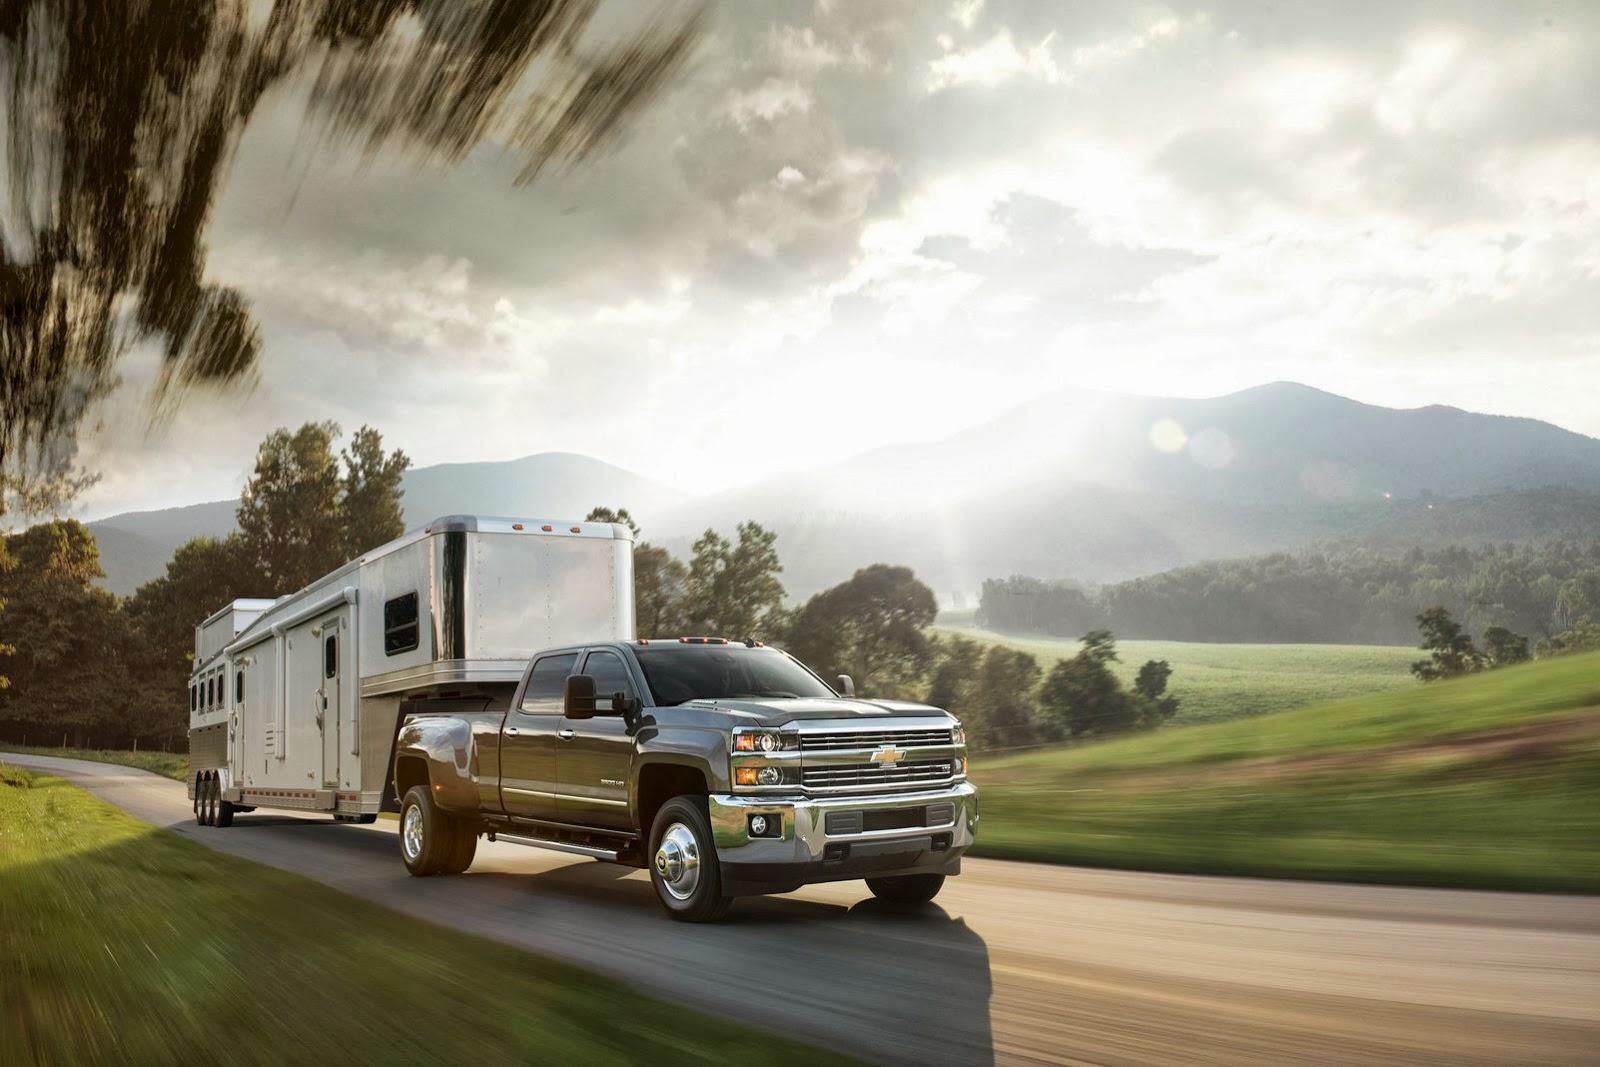 2015-Chevrolet-Silverado-3500-HD-3%25255B2%25255D.jpg